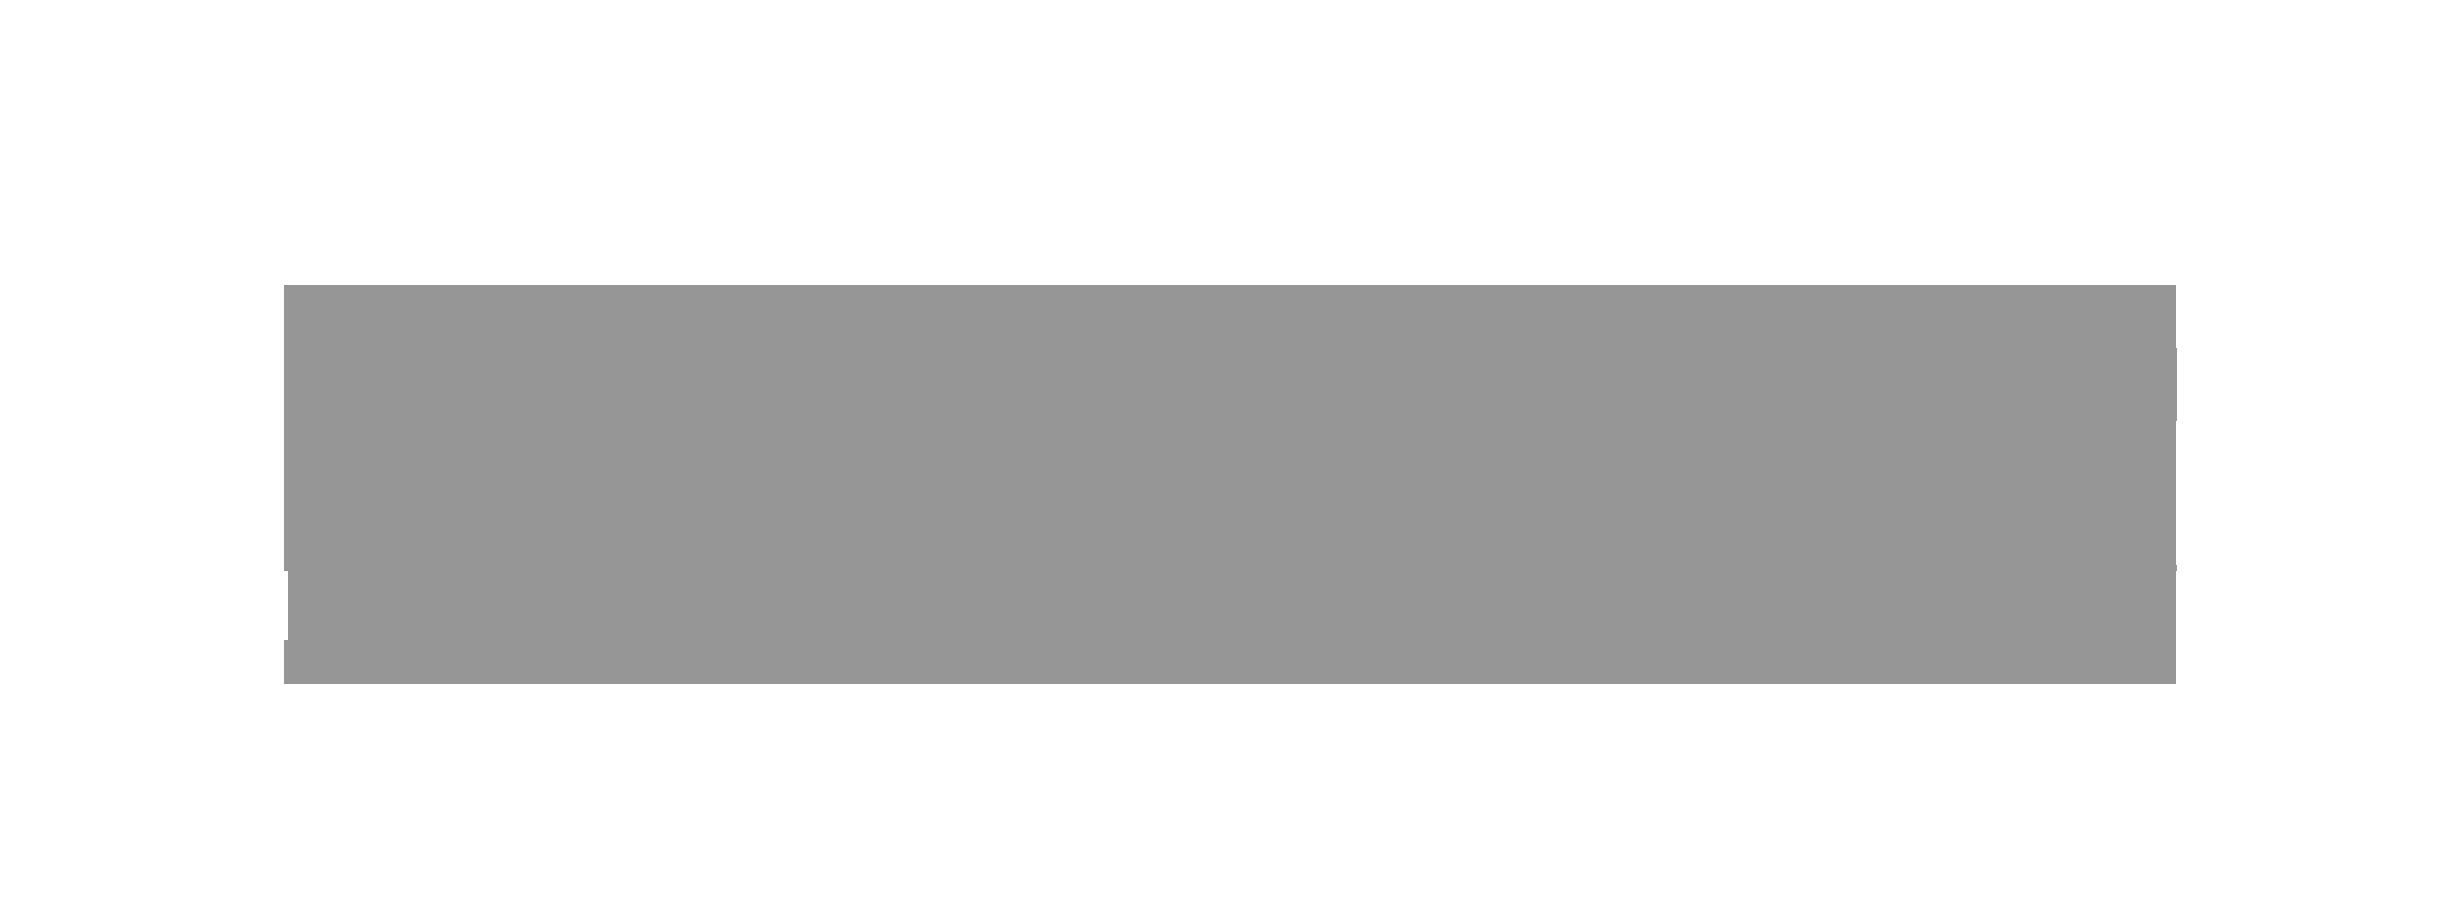 paladinVR_logo.png